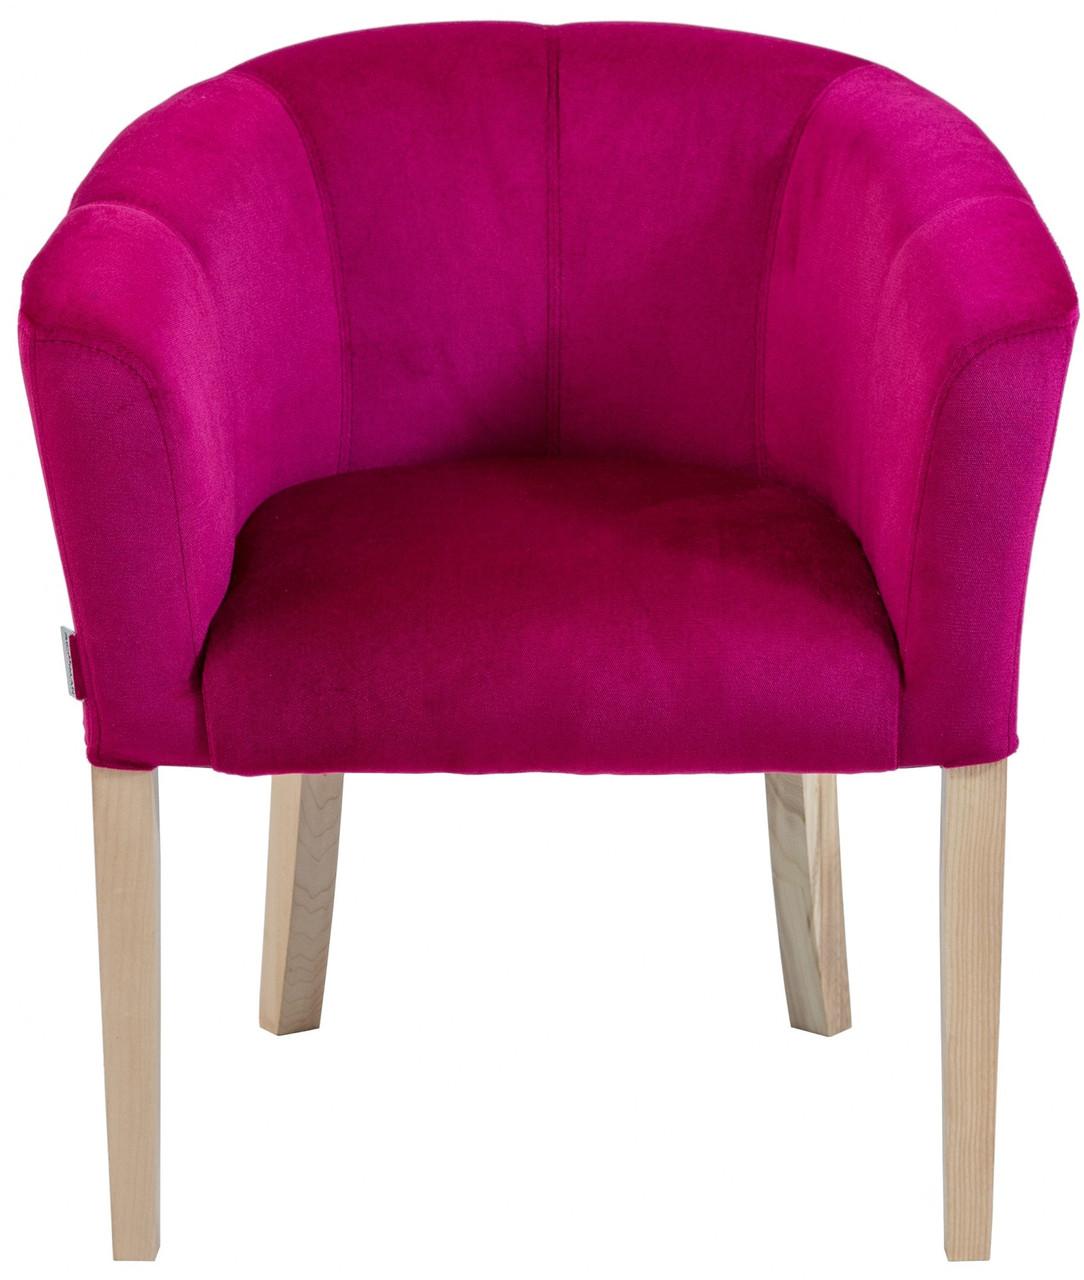 Кресло Richman Версаль 65 x 65 x 75H Малиновый